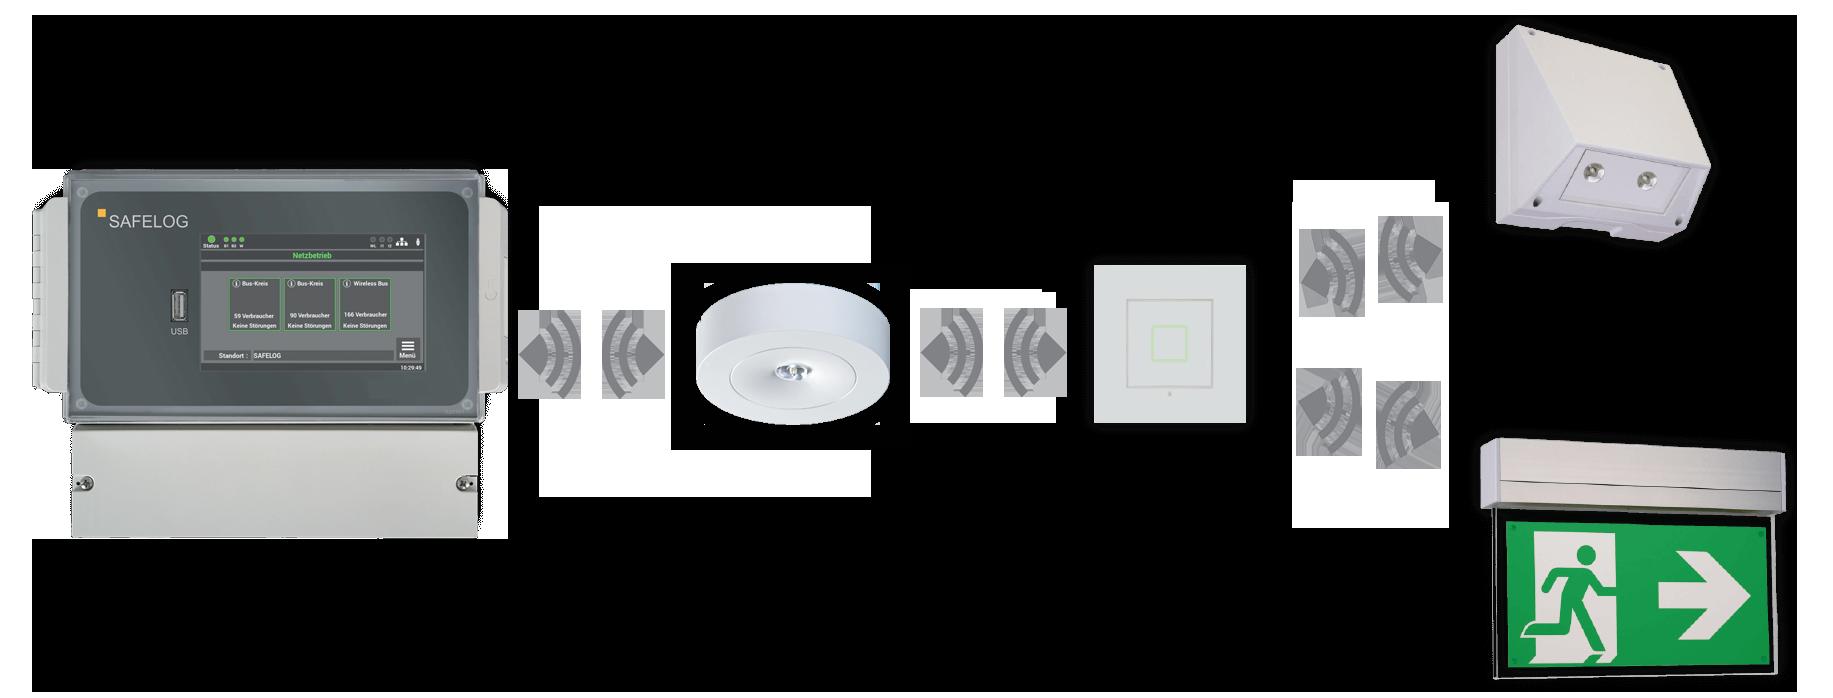 SAFELOG Wireless